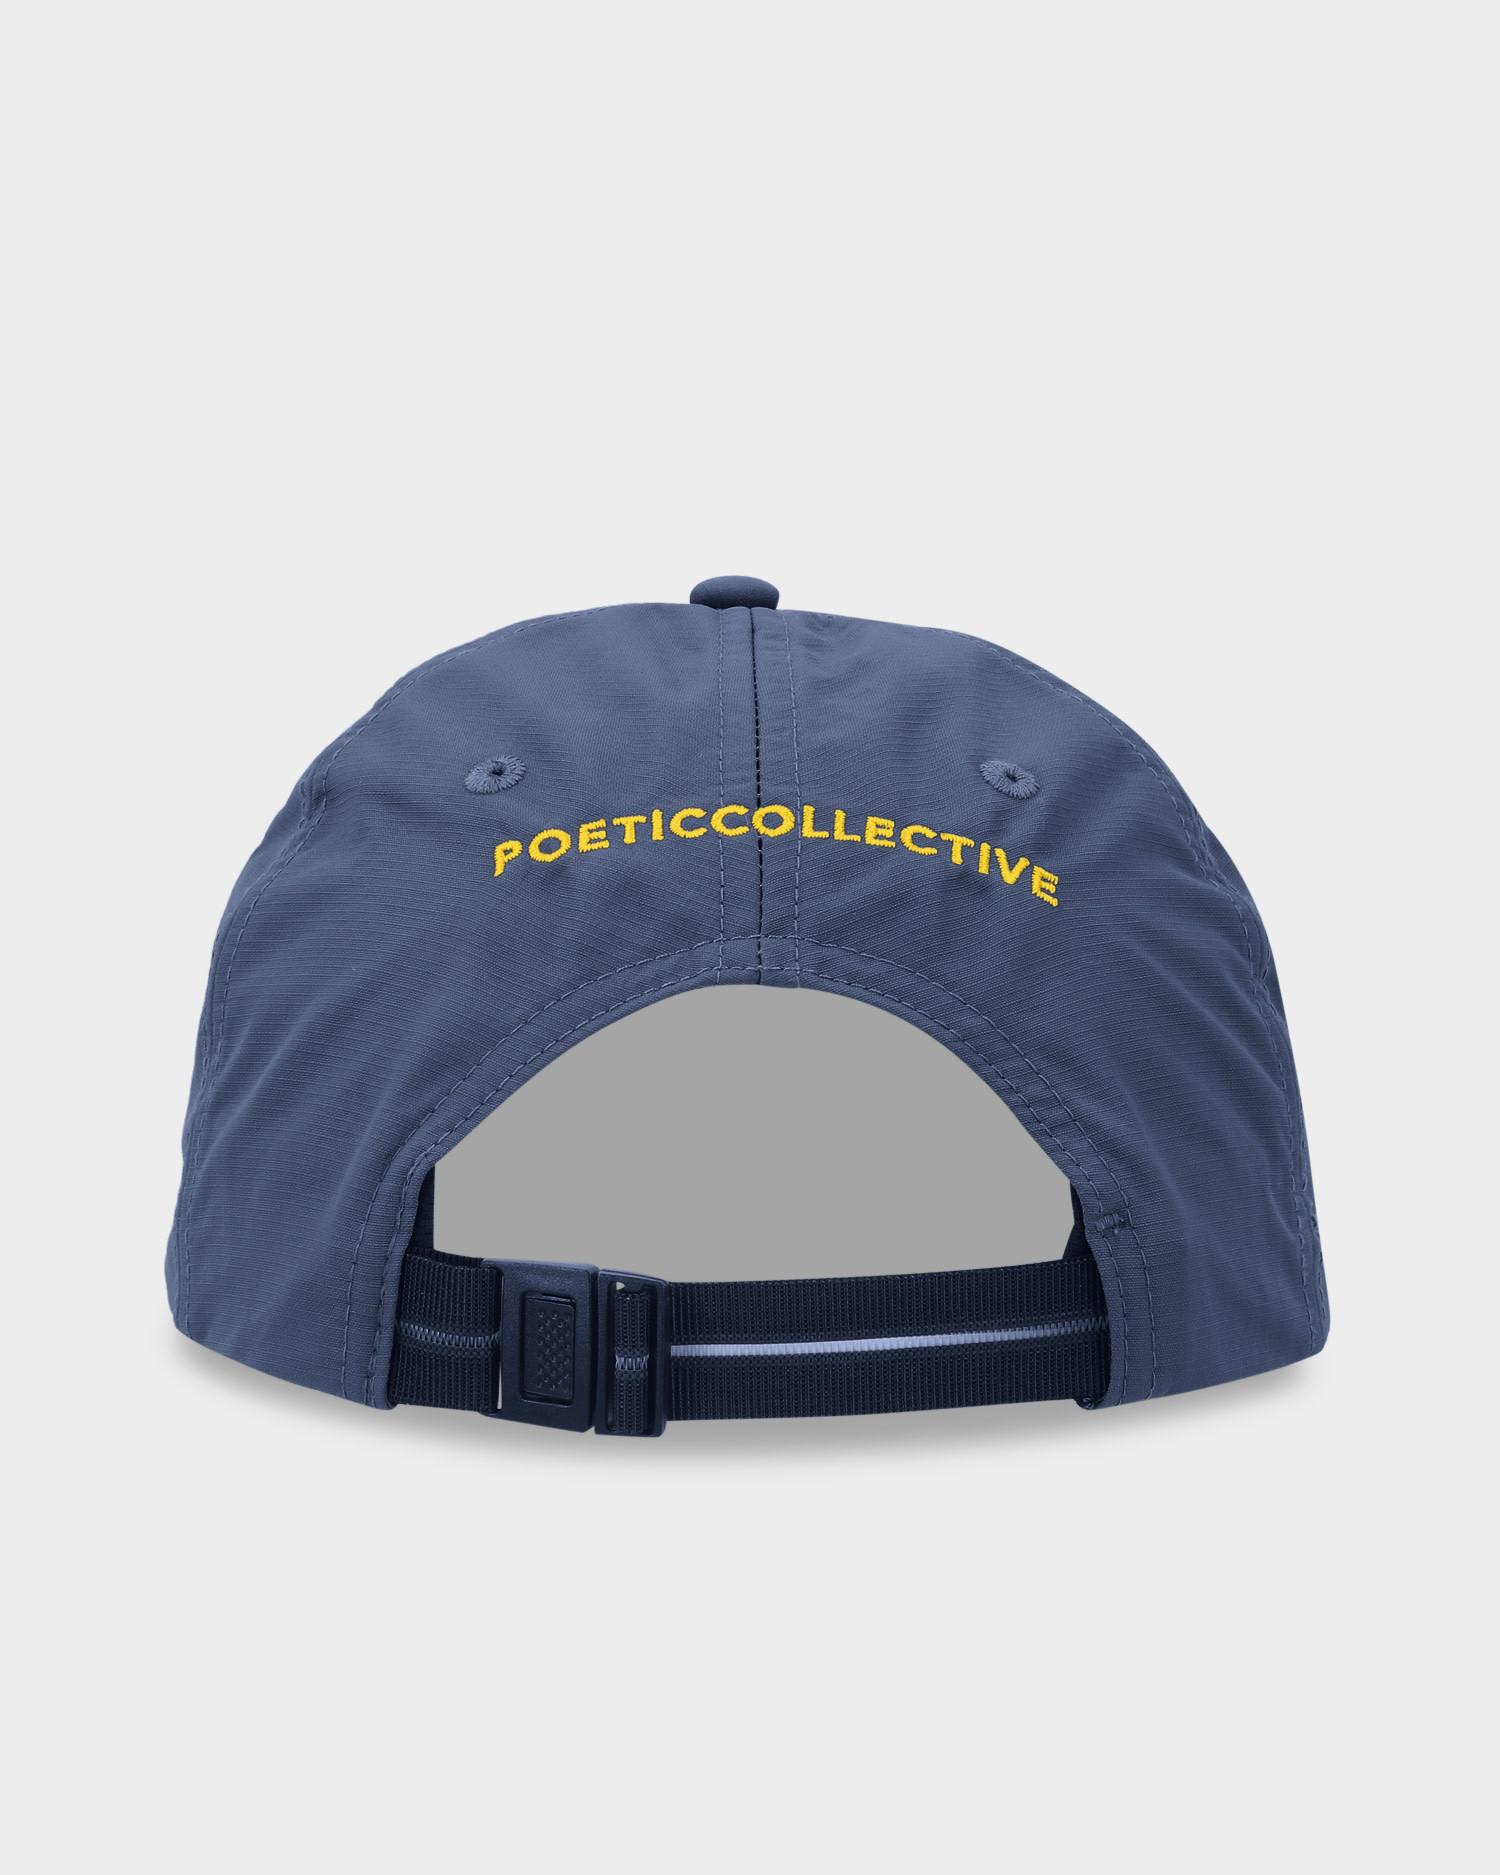 Poetic Collective Sport Cap Navy/Yellow